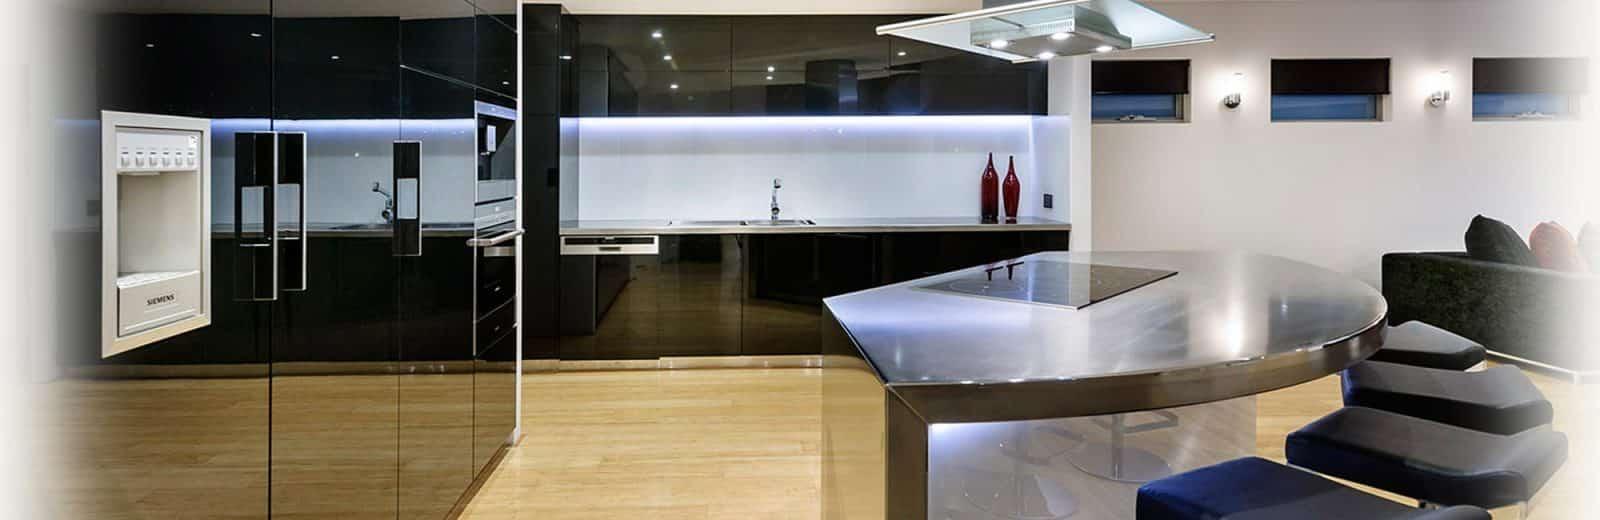 Kitchens perth kitchen cabinets bathroom cupboards for Kitchen cabinets perth